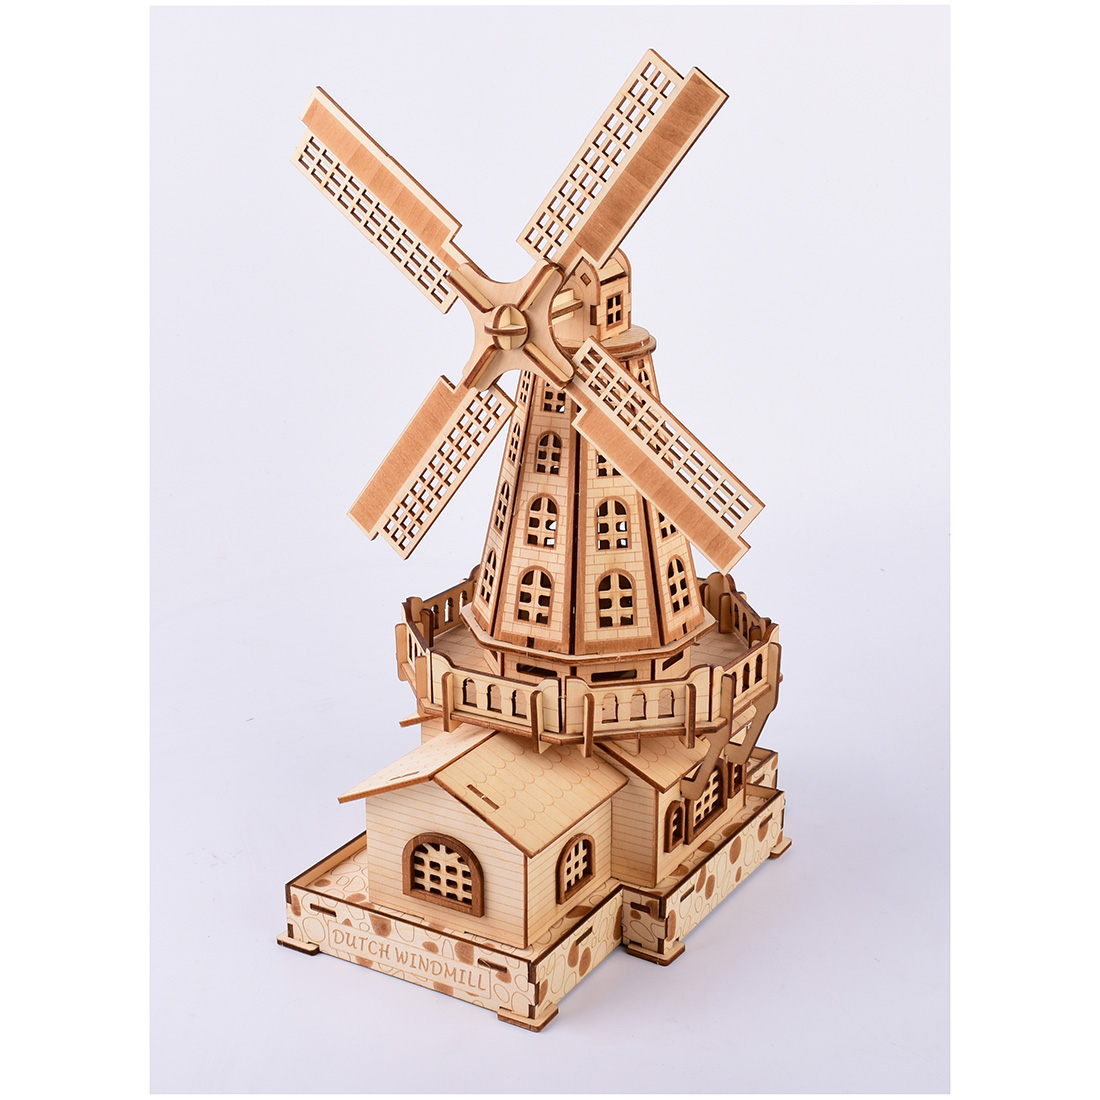 2019 New High-precision Laser Cutting Puzzle 3D Wooden Jigsaw Model Building Kits - Dutch Windmill